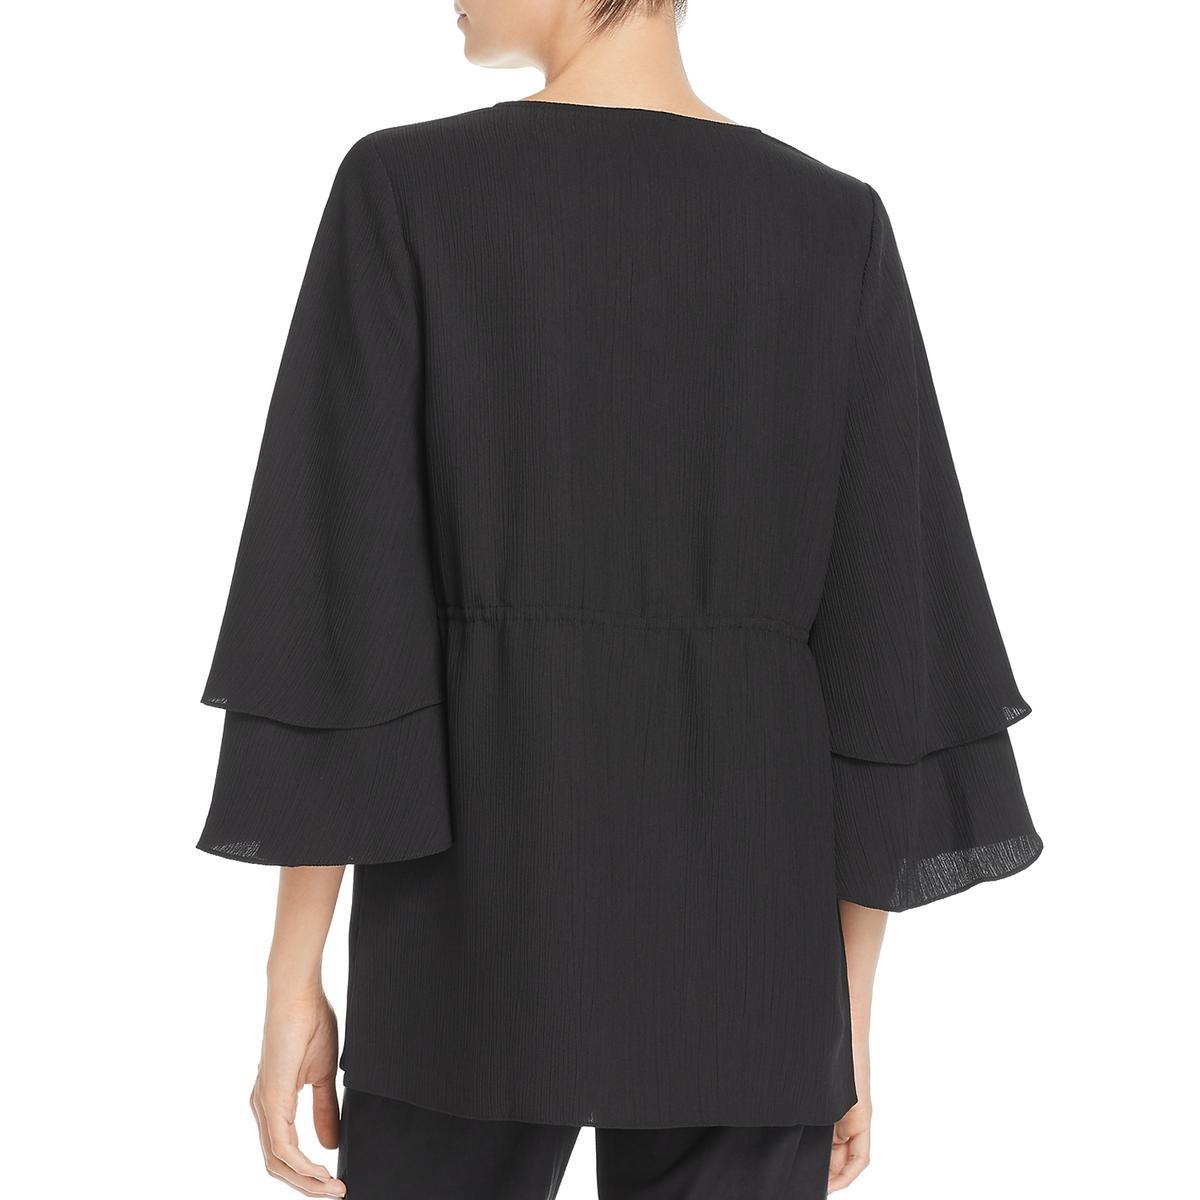 Lysse Womens Remy Velvet Bell Sleeves Blouse Tunic Top Shirt BHFO 8954